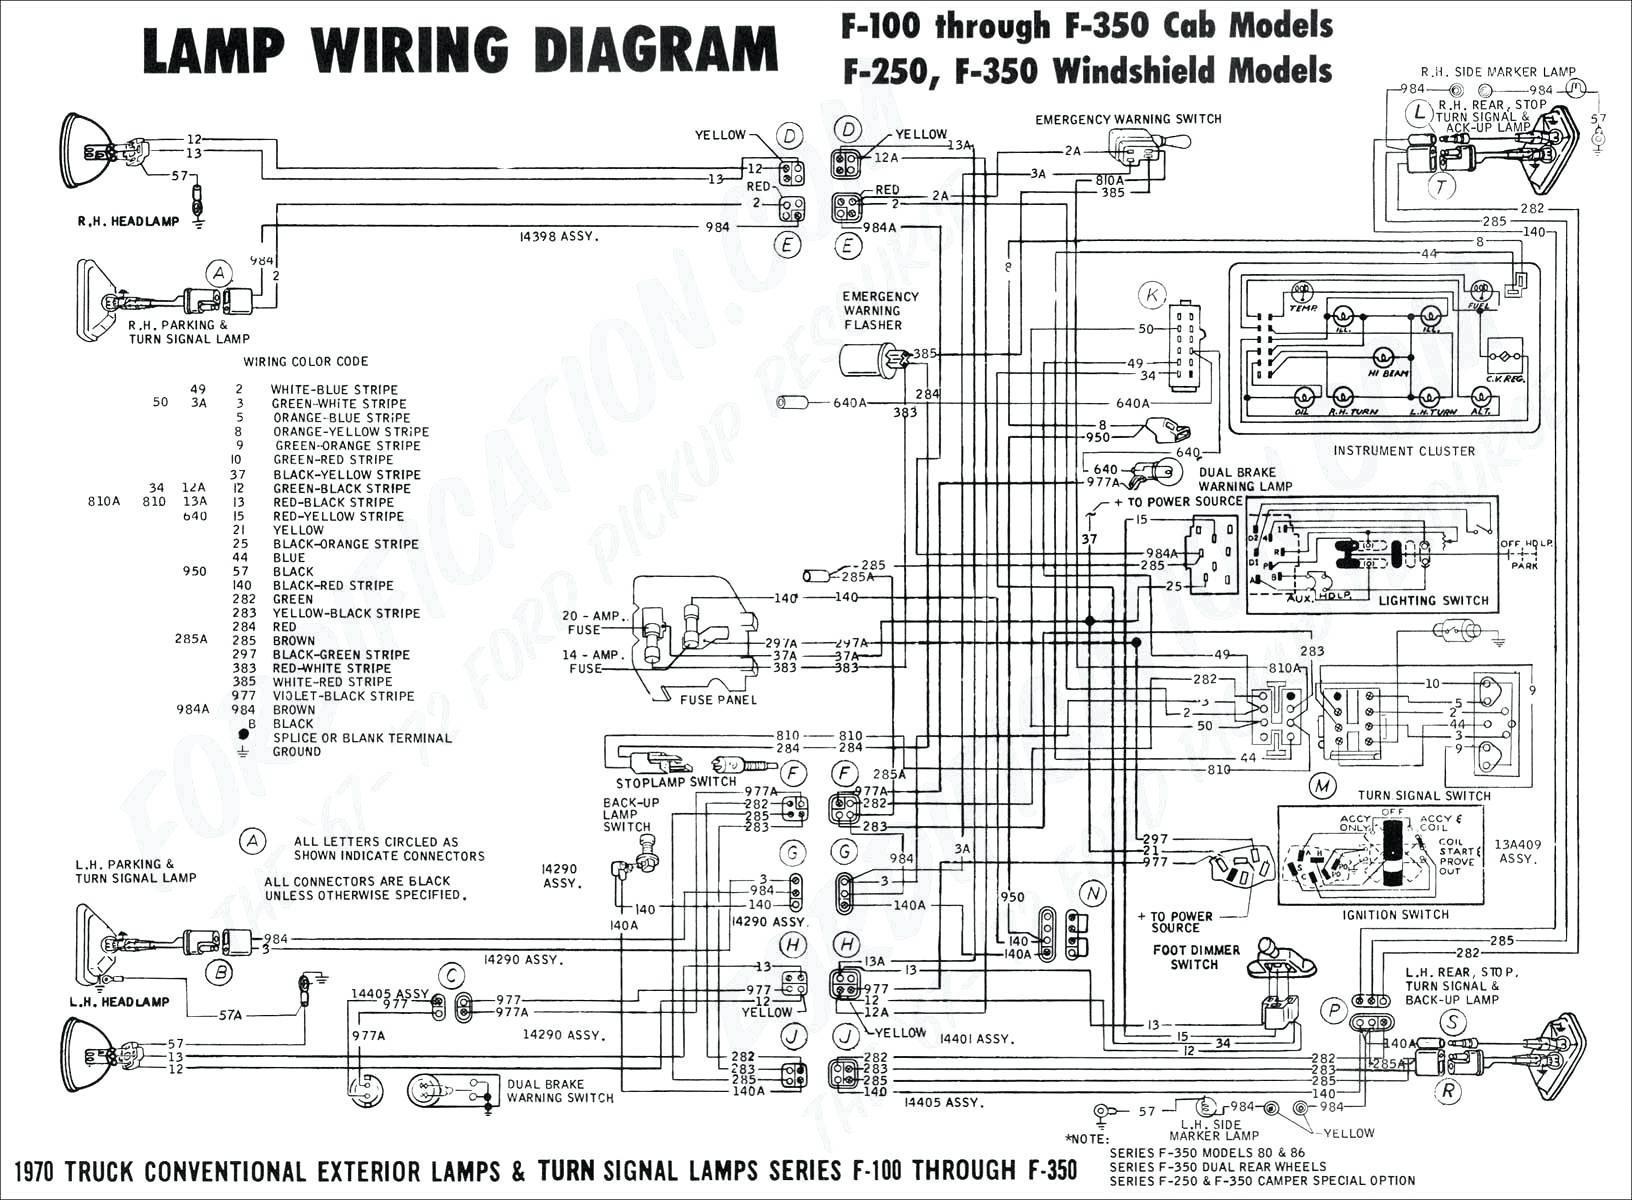 2001 Dodge Ram Radio Wiring Diagram 98 Dodge Ram Stereo Wiring Wiring Diagram Inside Of 2001 Dodge Ram Radio Wiring Diagram 2001 Dodge Ram Radio Wiring Diagram Wiring Diagram toolbox